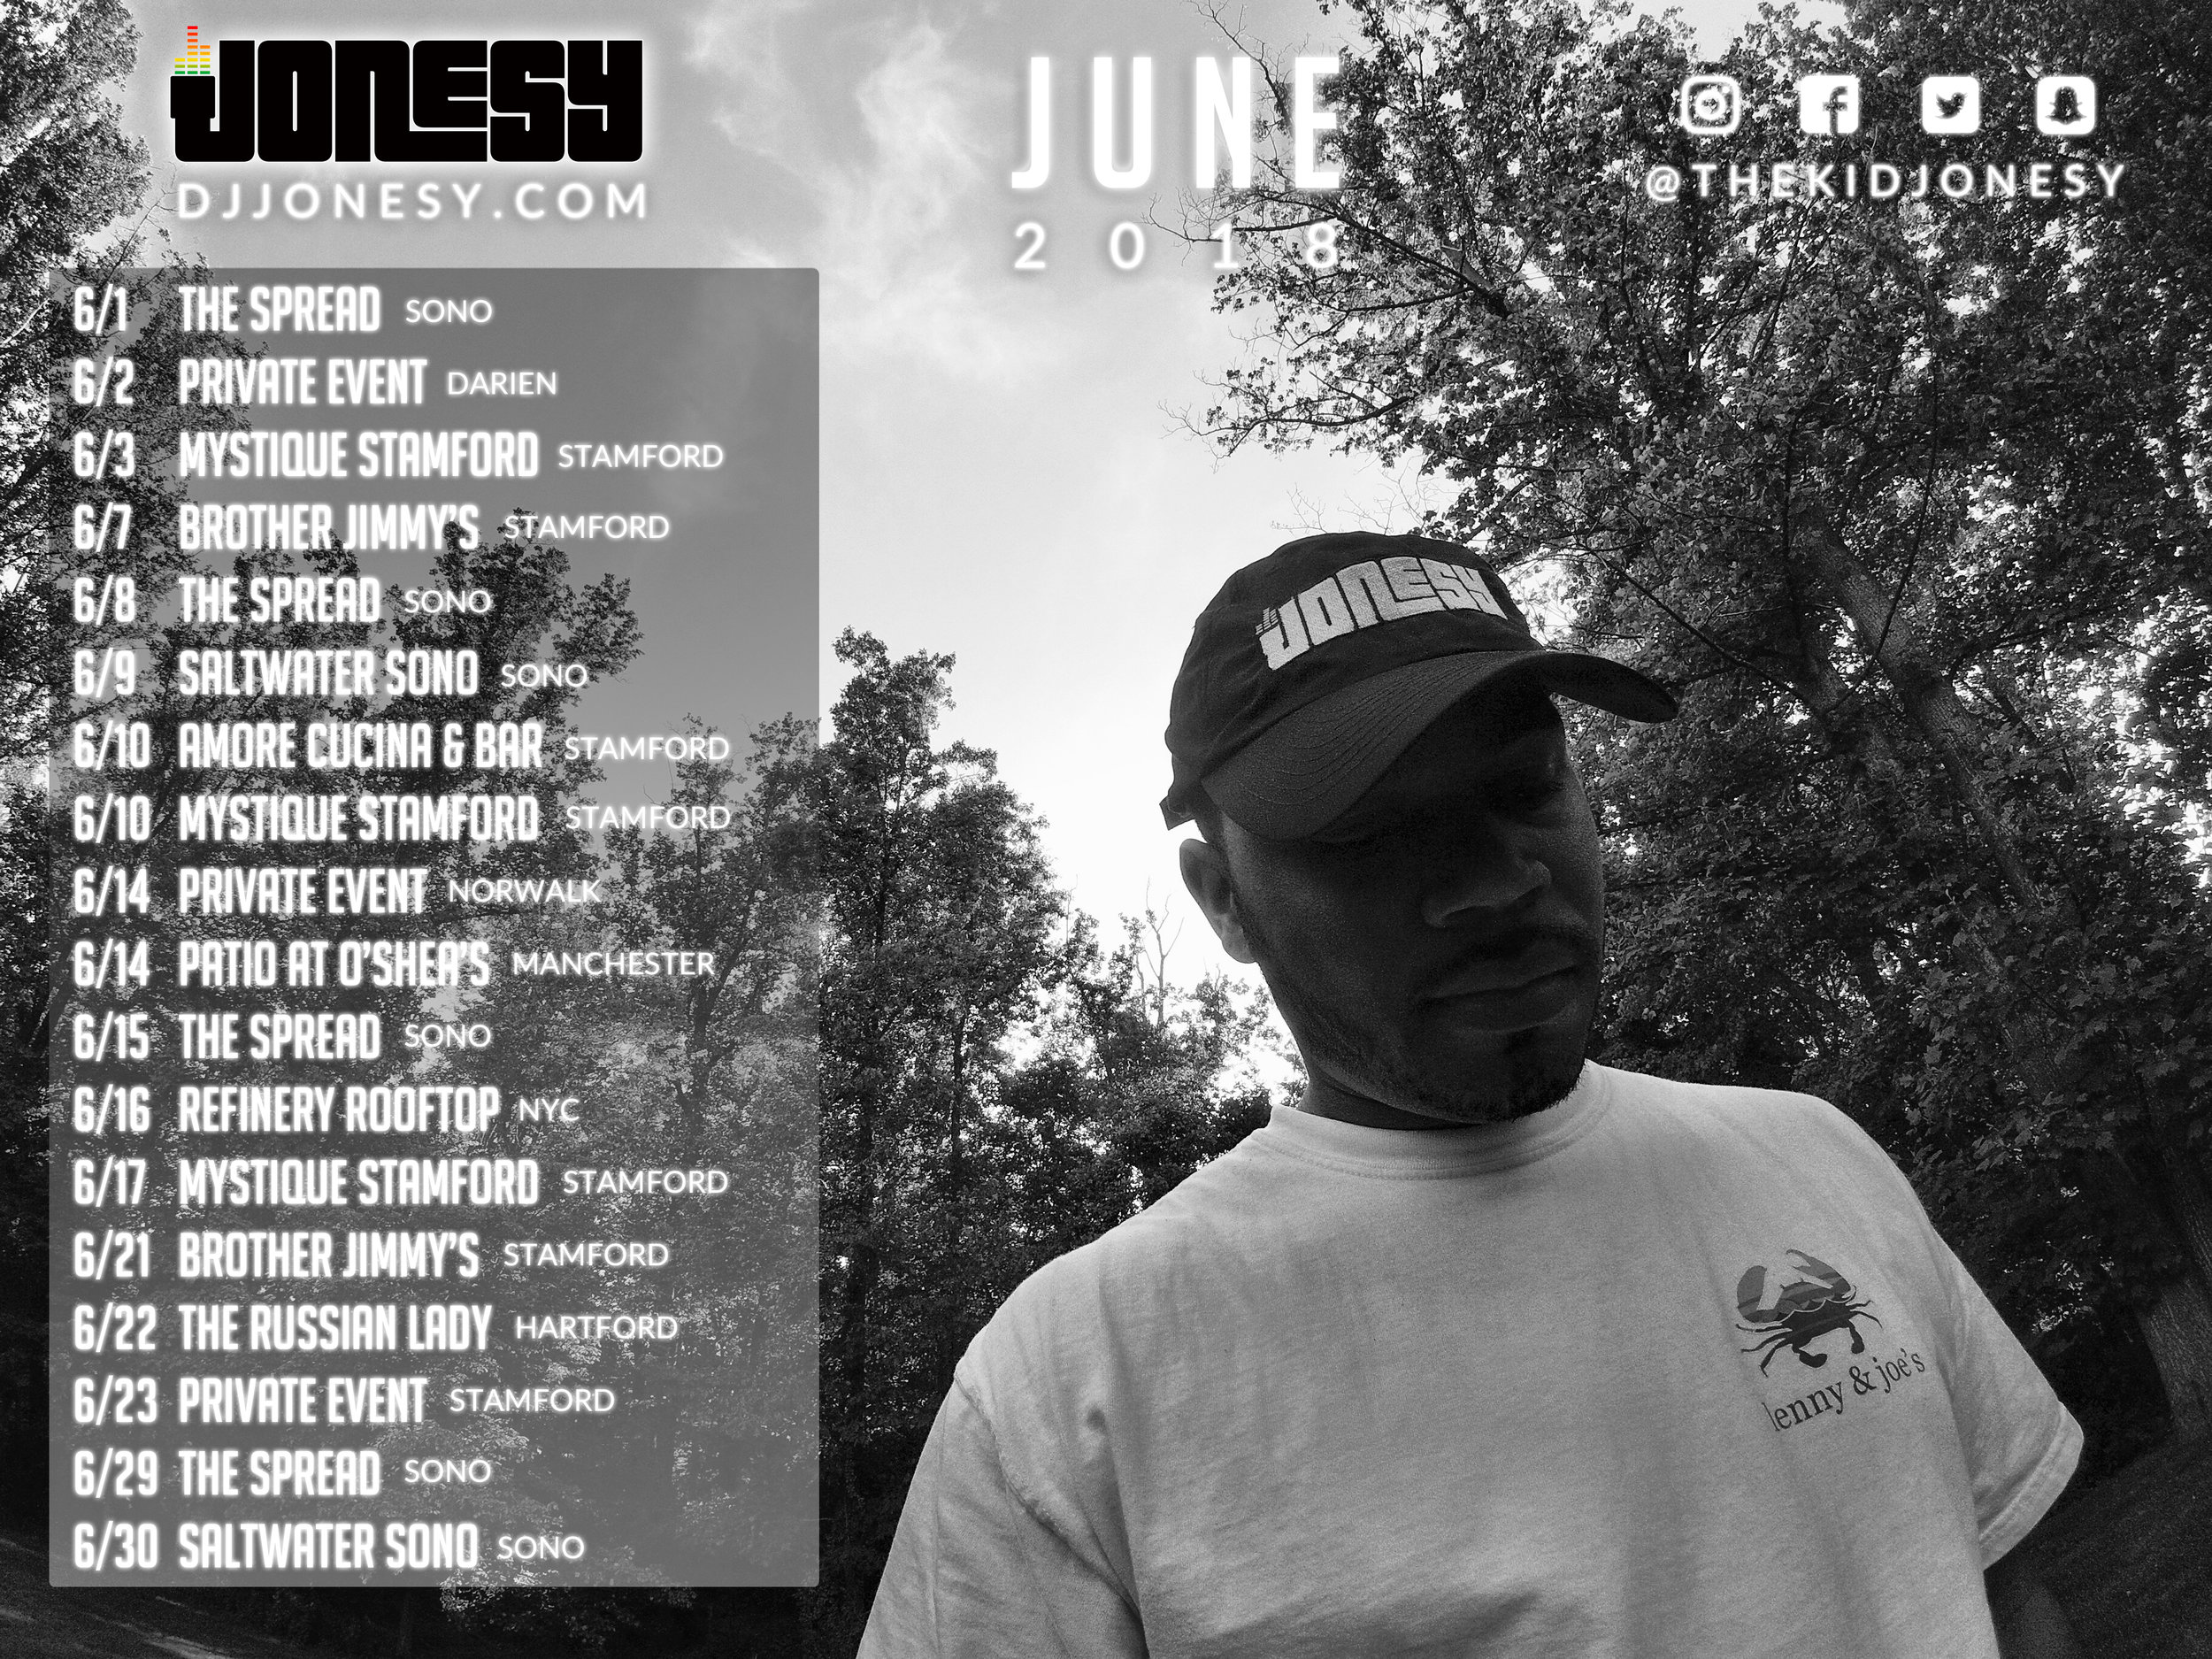 JUNE2018-DJ-SCHEDULE-DJ-JONESY.jpg